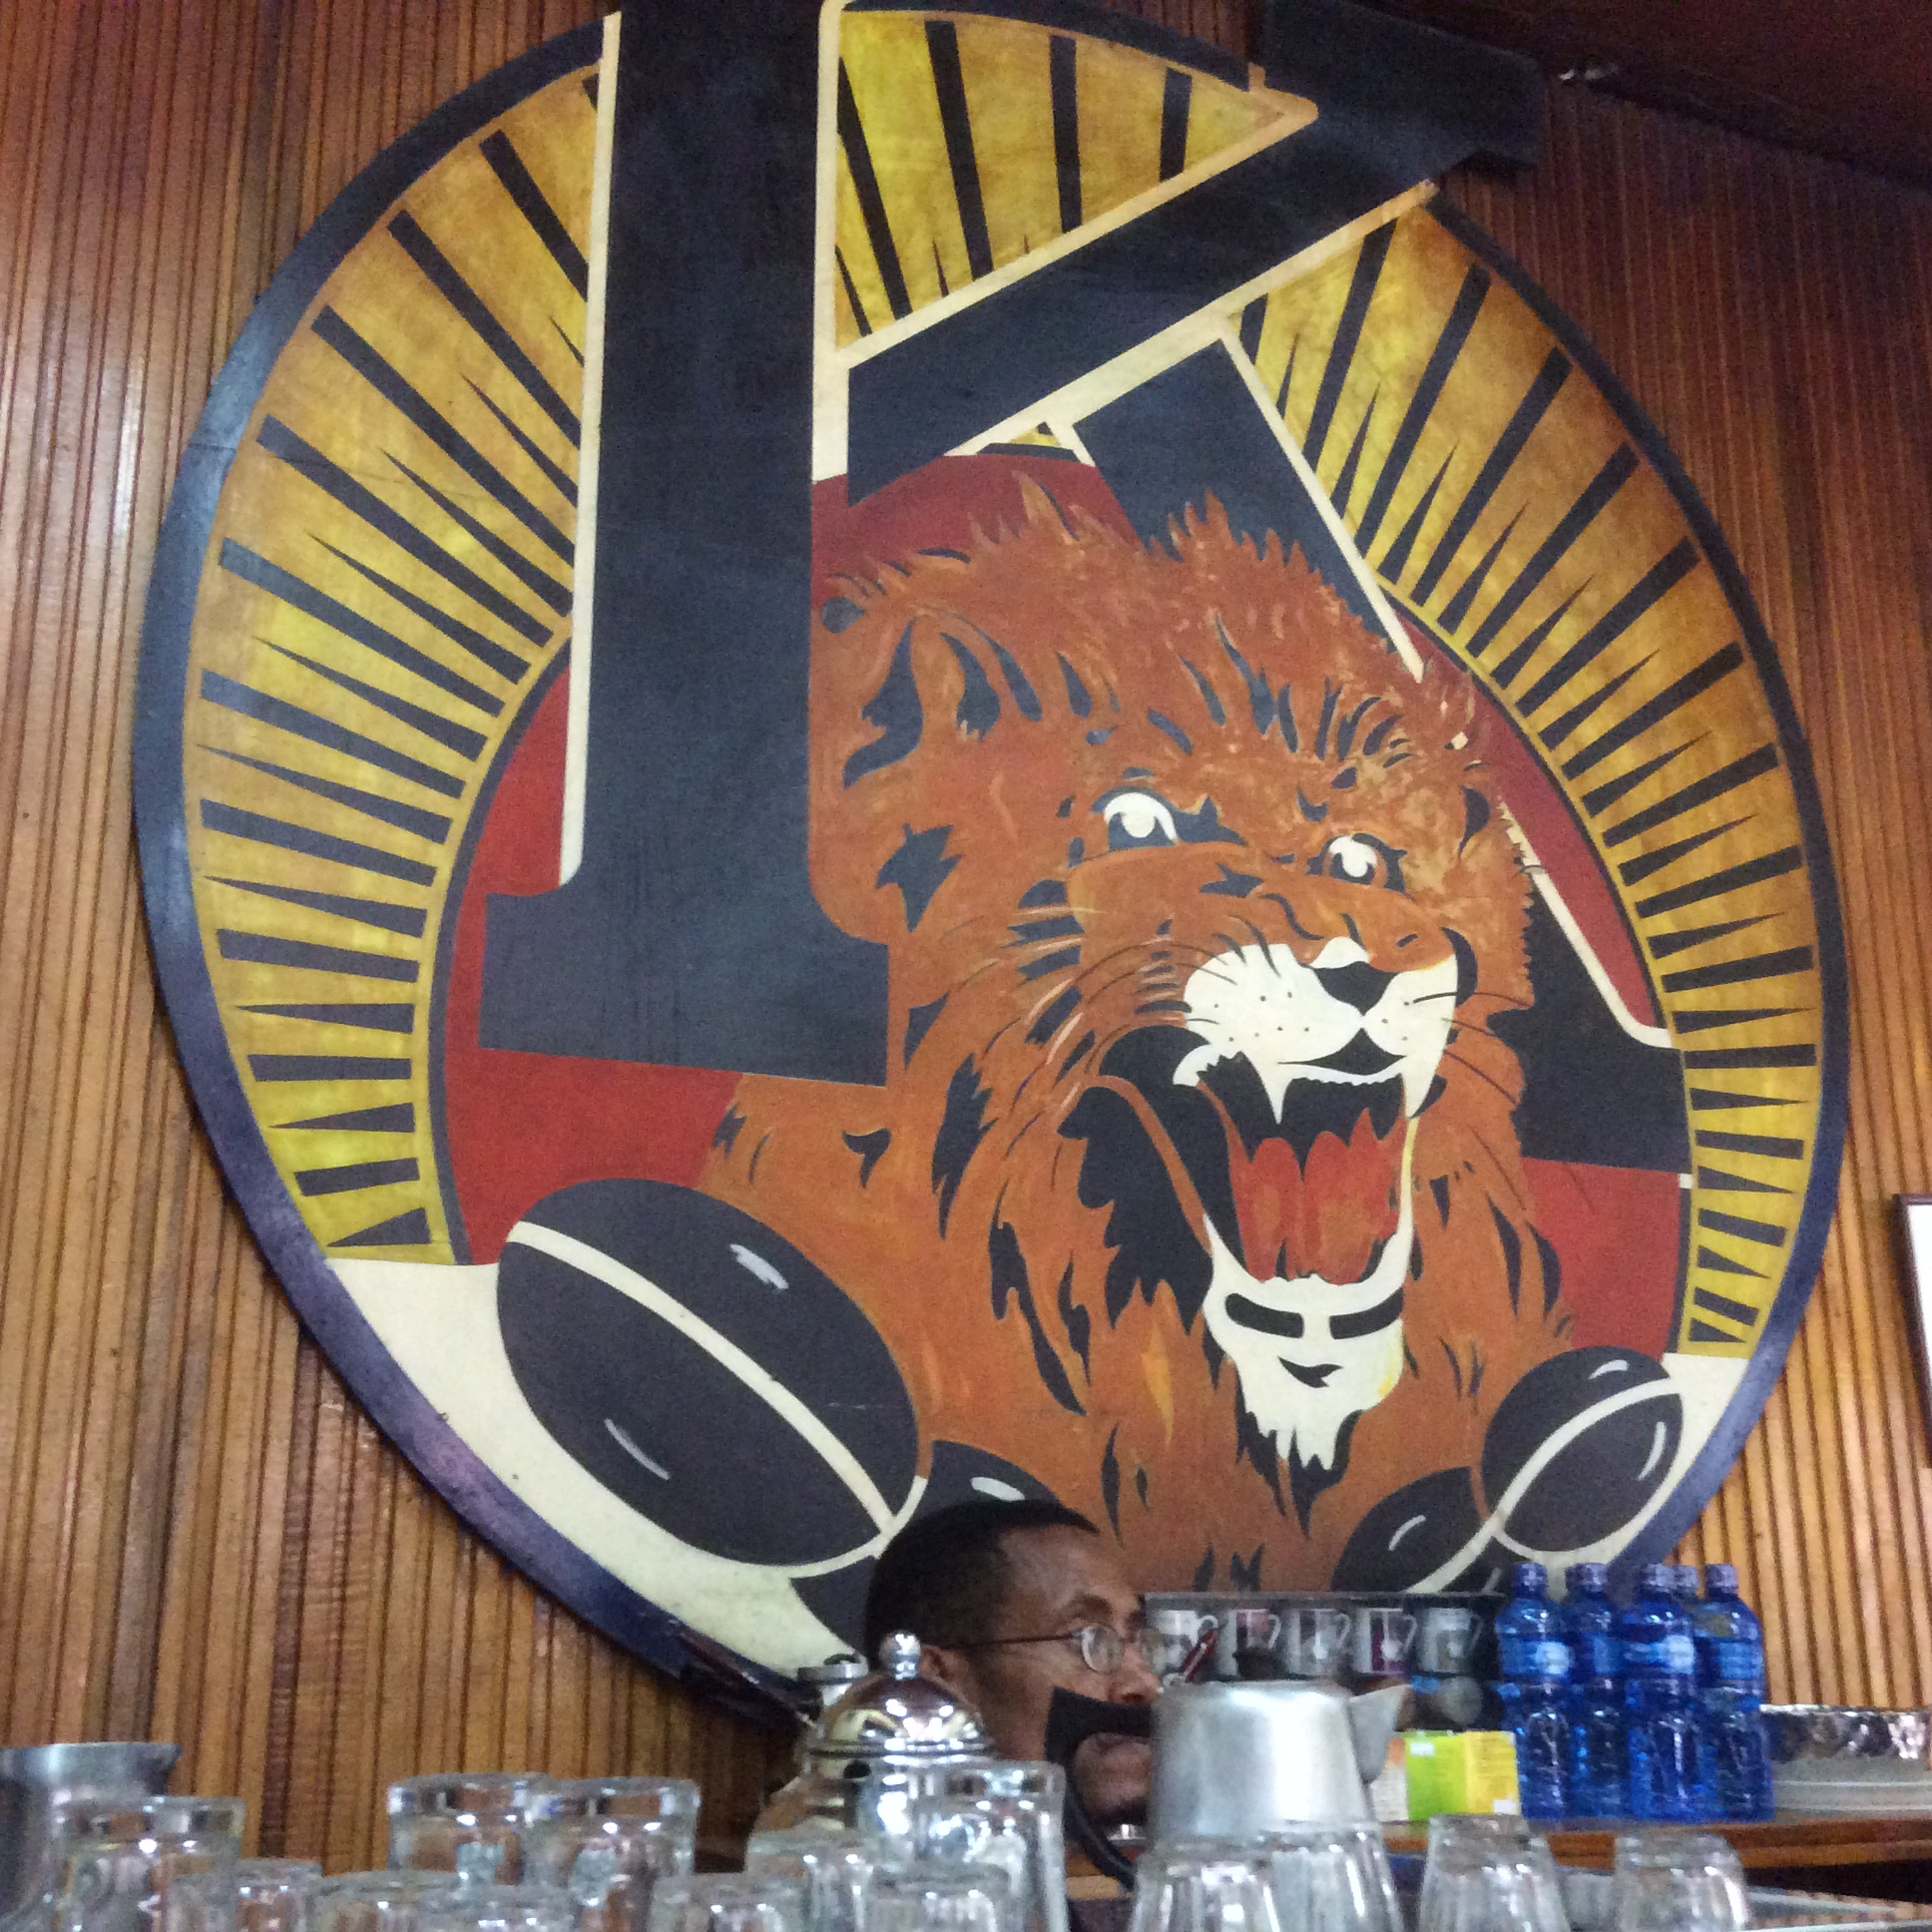 Tomoco, Addis Ababa's FamousCoffee Shop